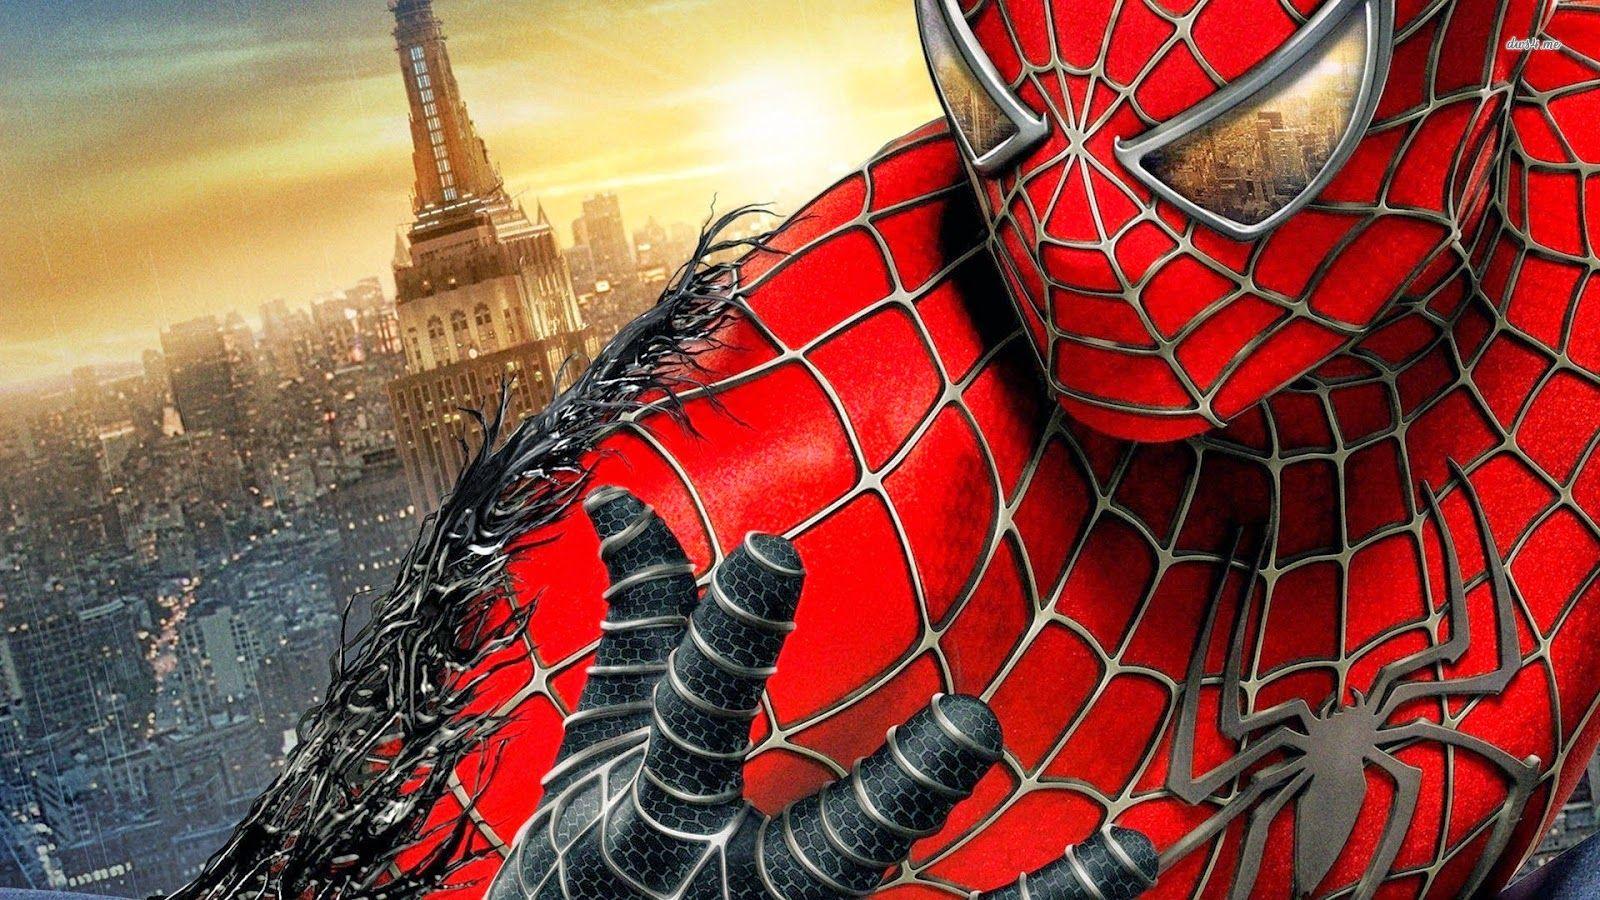 spiderman wallpaper 1600x900 july - photo #37